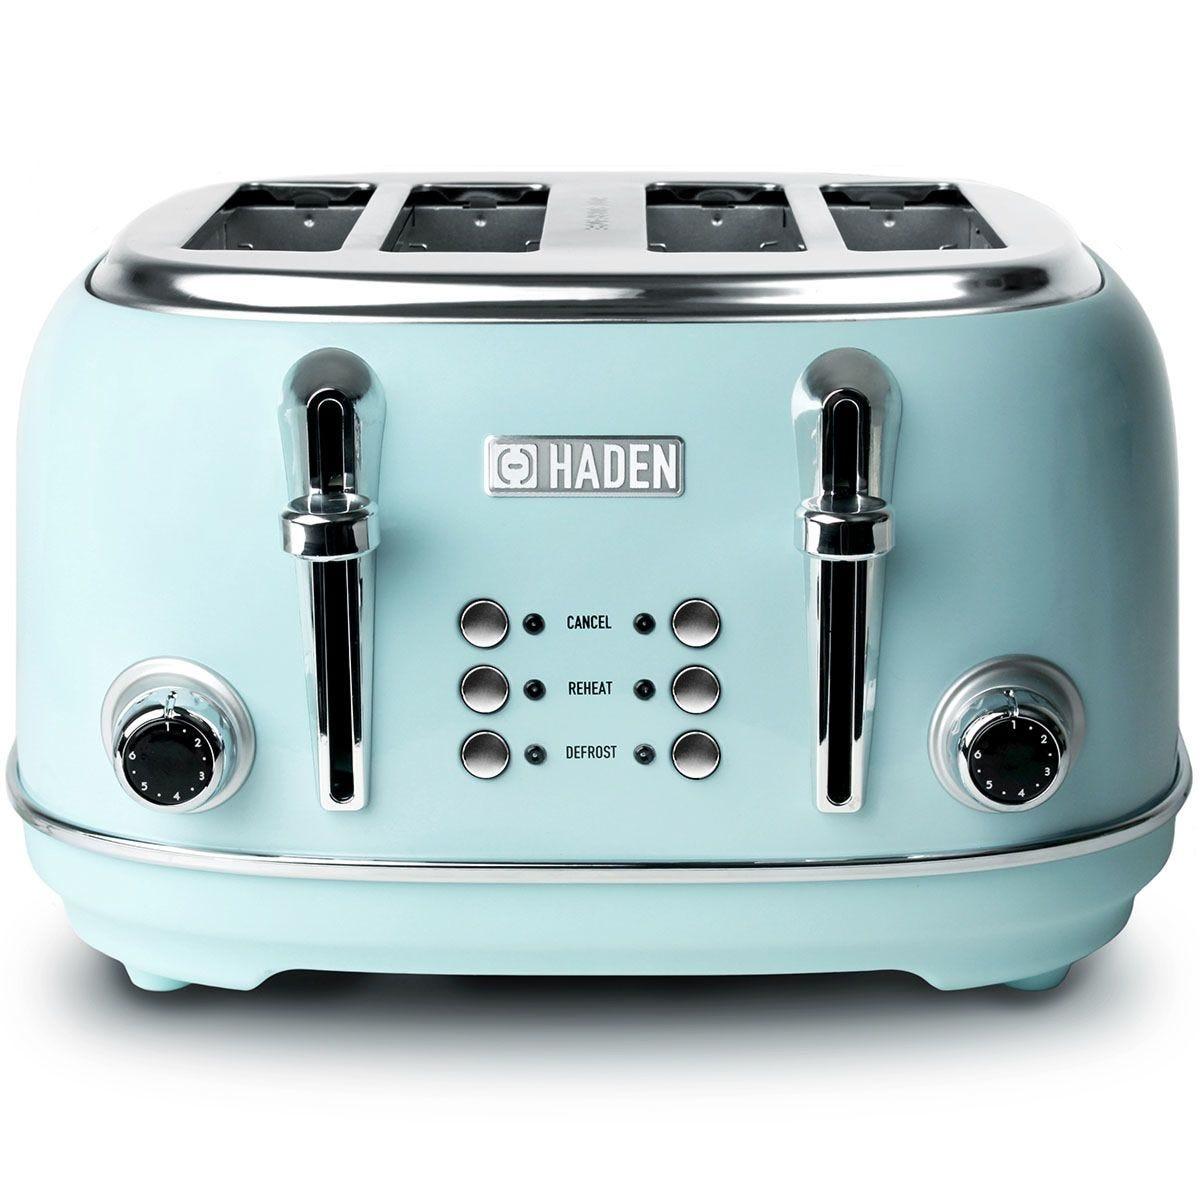 Haden 194244 Heritage 4-Slice Toaster - Turquoise